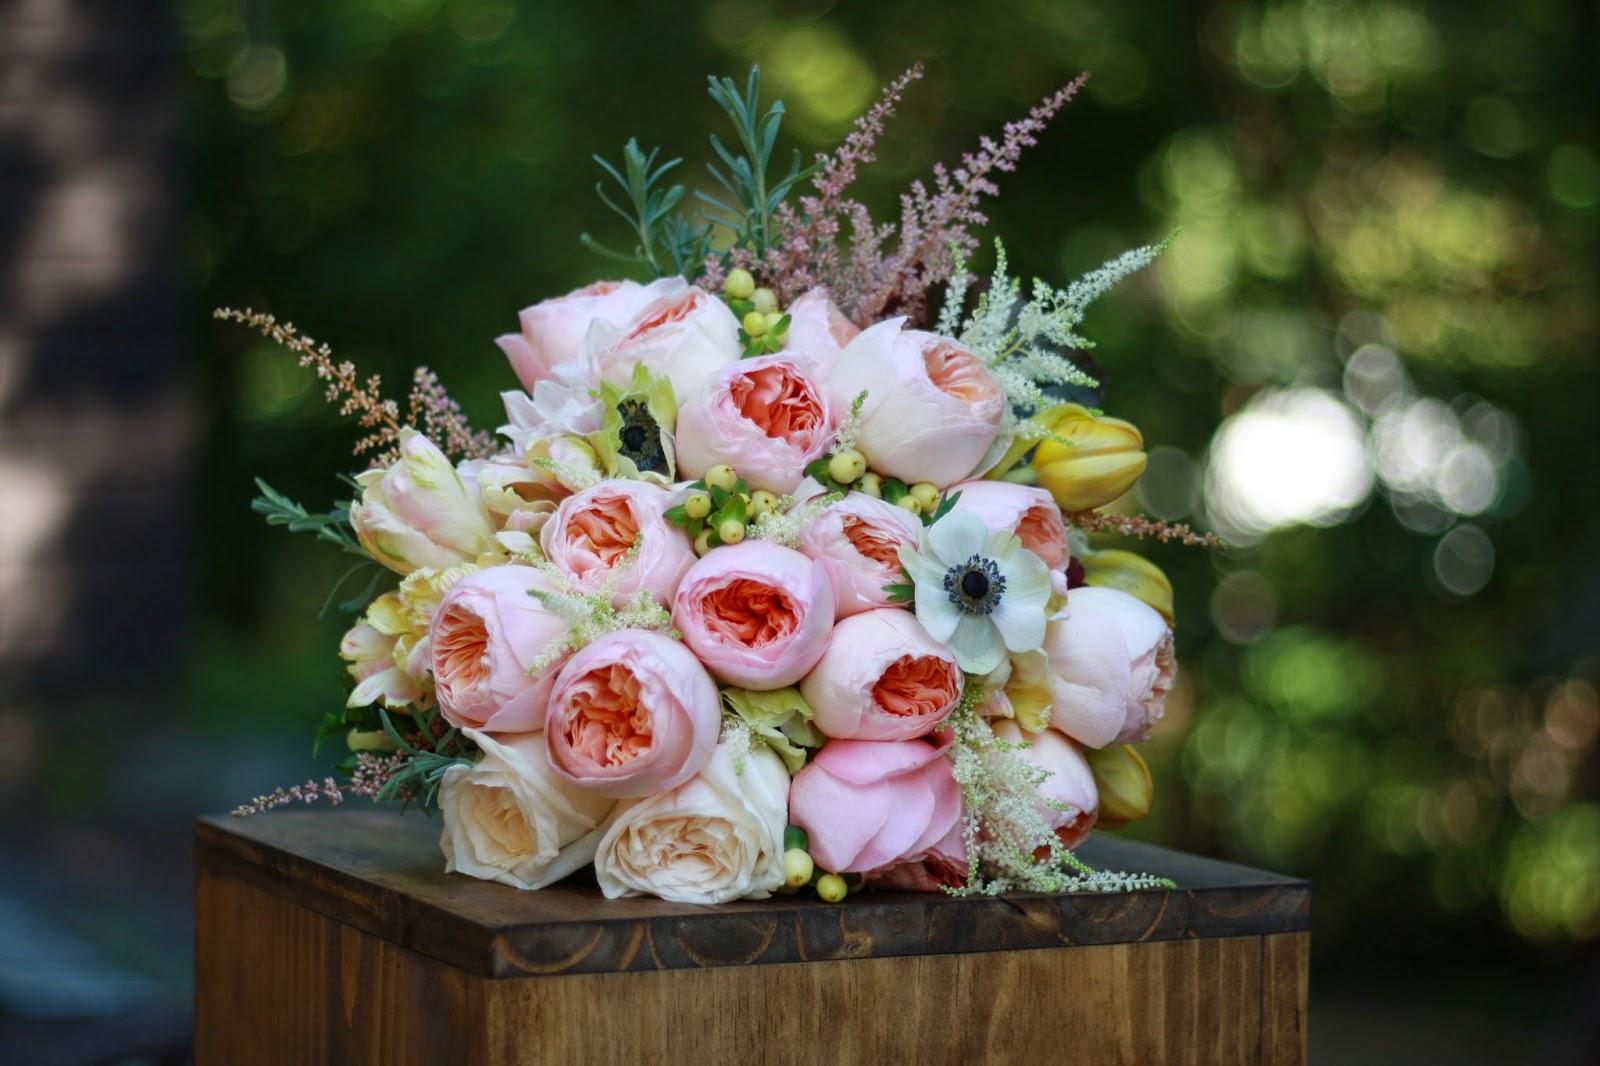 Bridal Bouquet - Elegant, lush and romantic hand-tied bouquet with movement composed of pale peach Juliet garden roses, blush garden roses, café au lait dahlias, anemones, pale pink astilbe, cream hypericum berry, white hydrangea